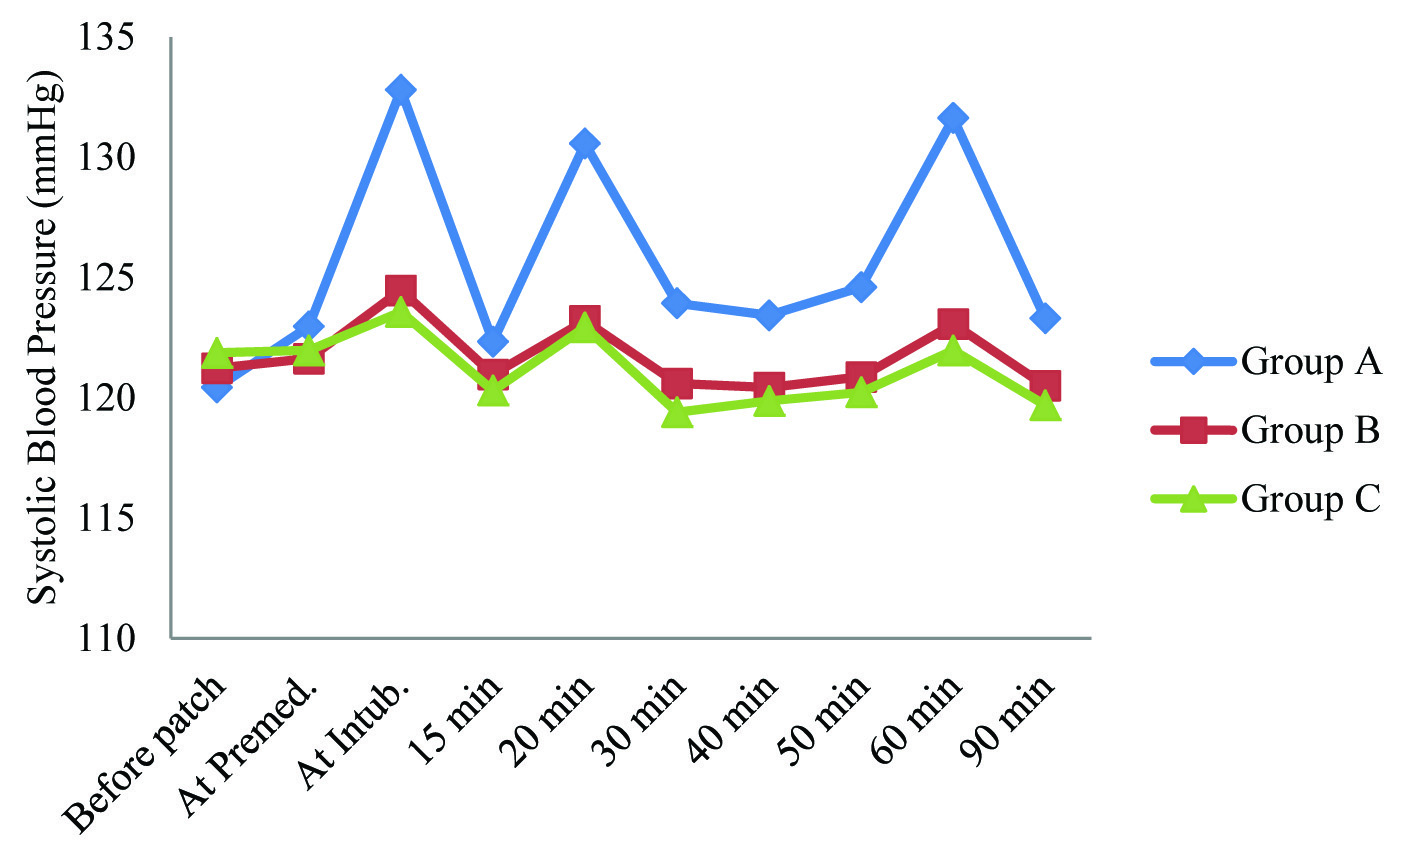 JCDR - Analgesia, Haemodynamic, Patch, Transdermal delivery